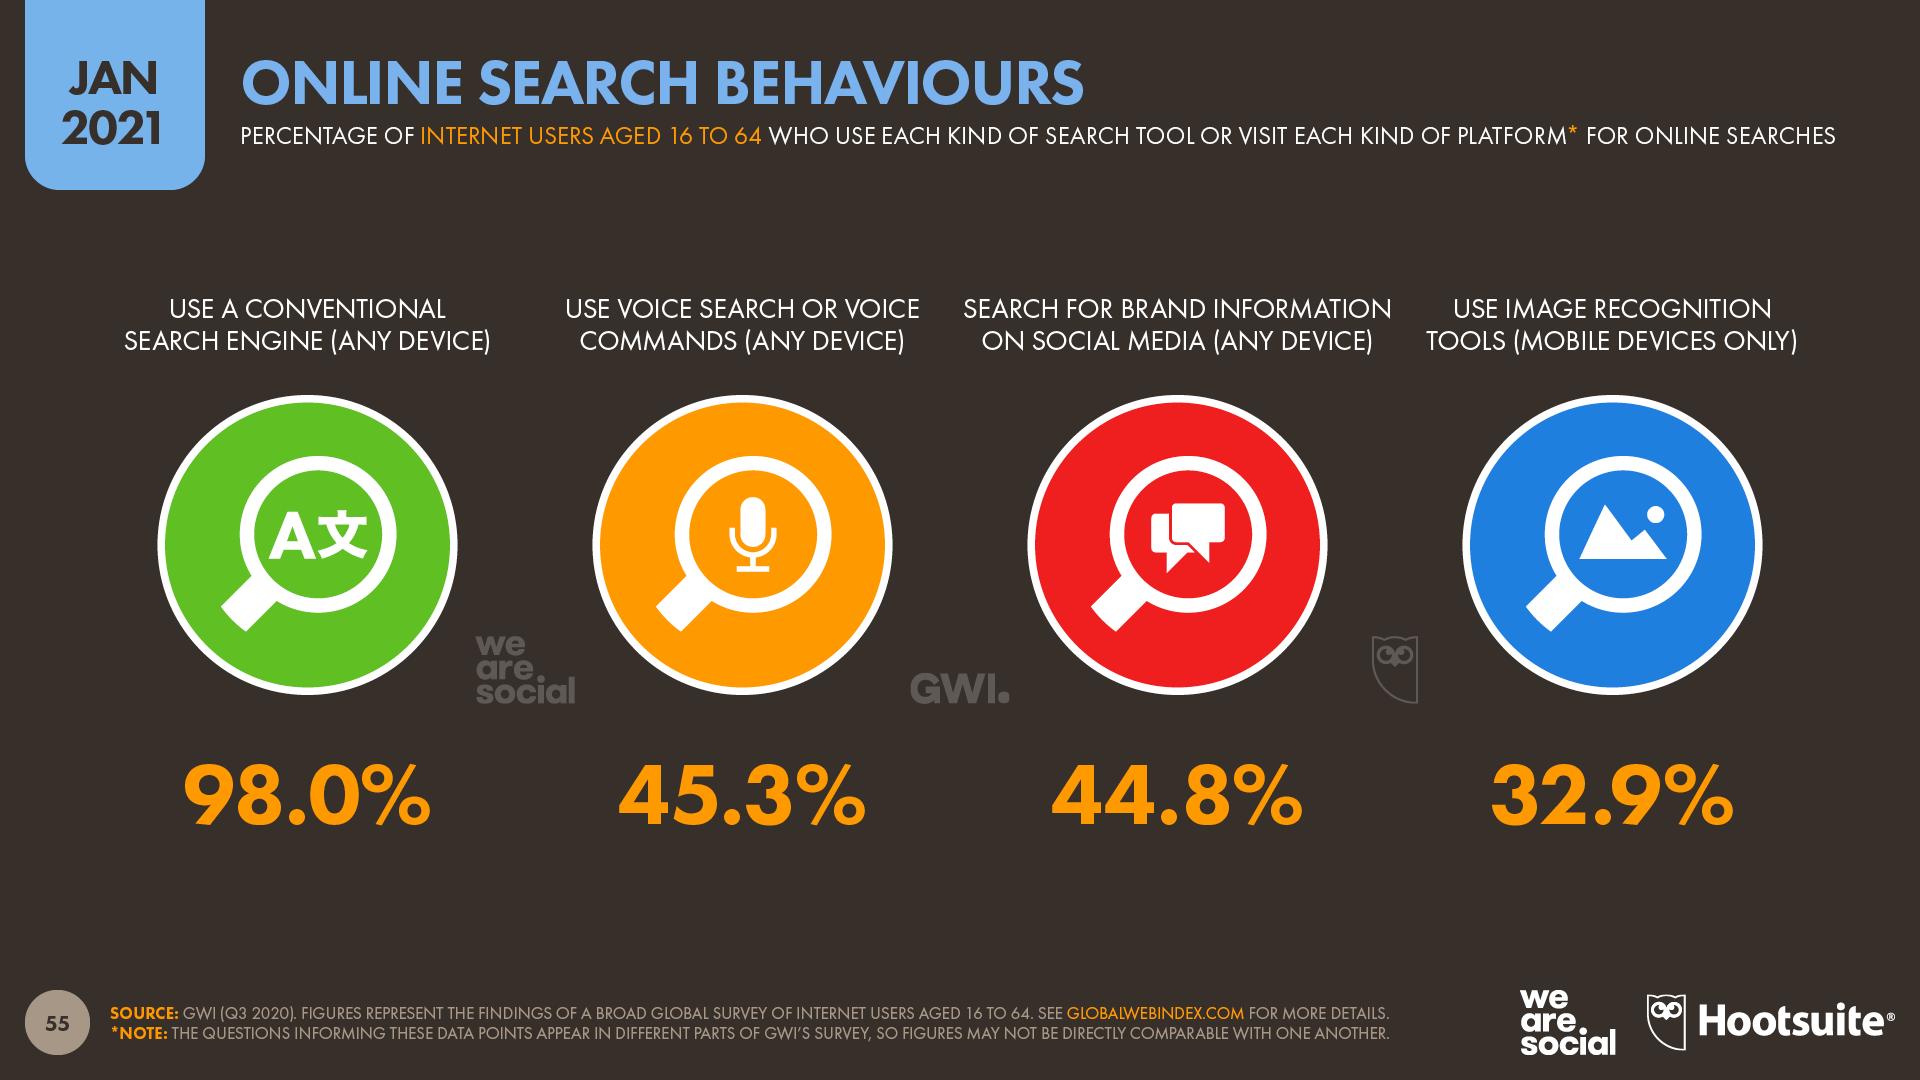 Online Search Behaviours January 2021 DataReportal